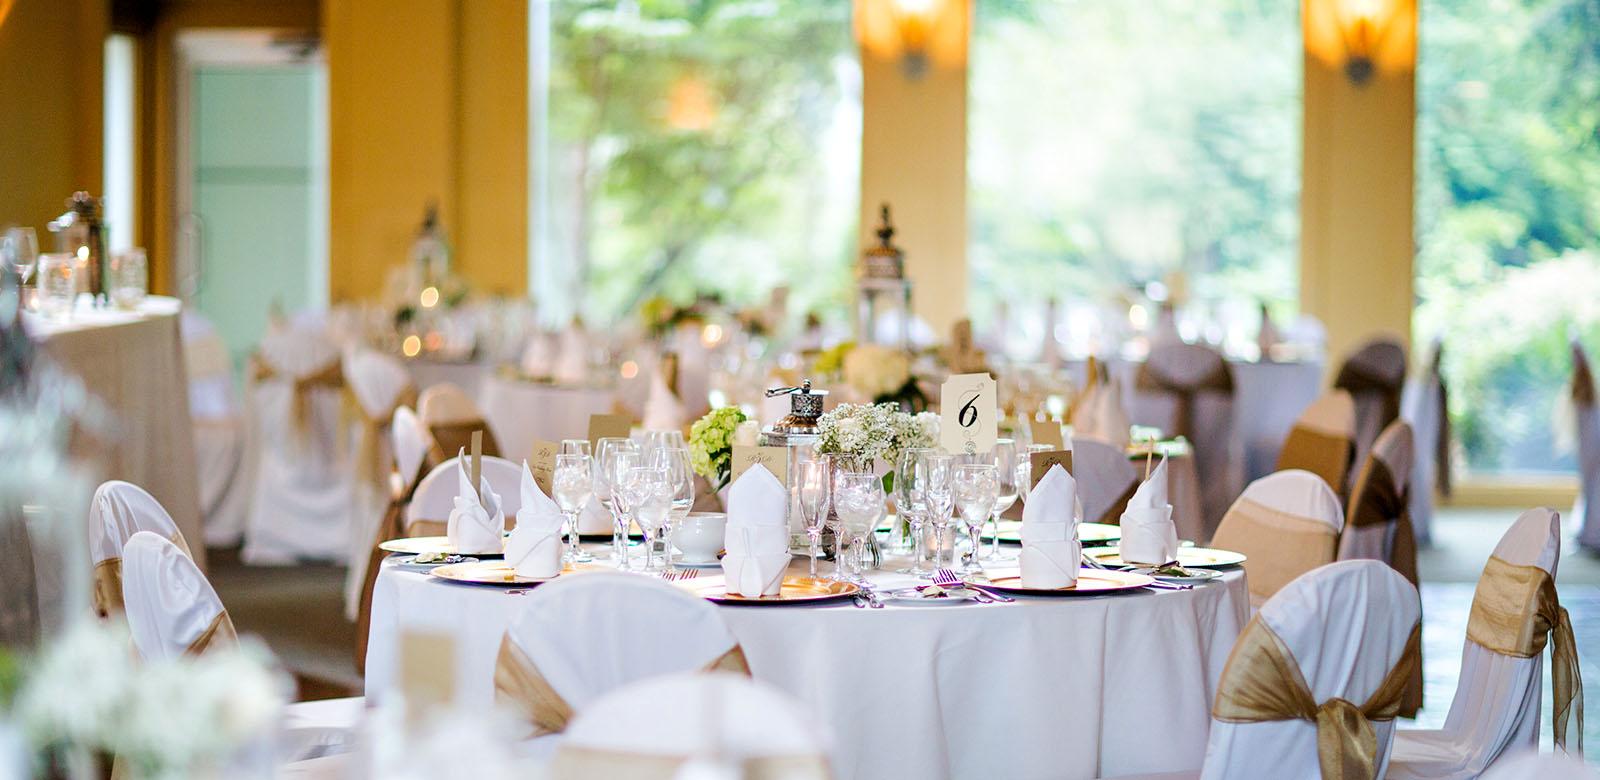 Ohio Wedding Venue Romantic Wedding Location Corporate Retreats